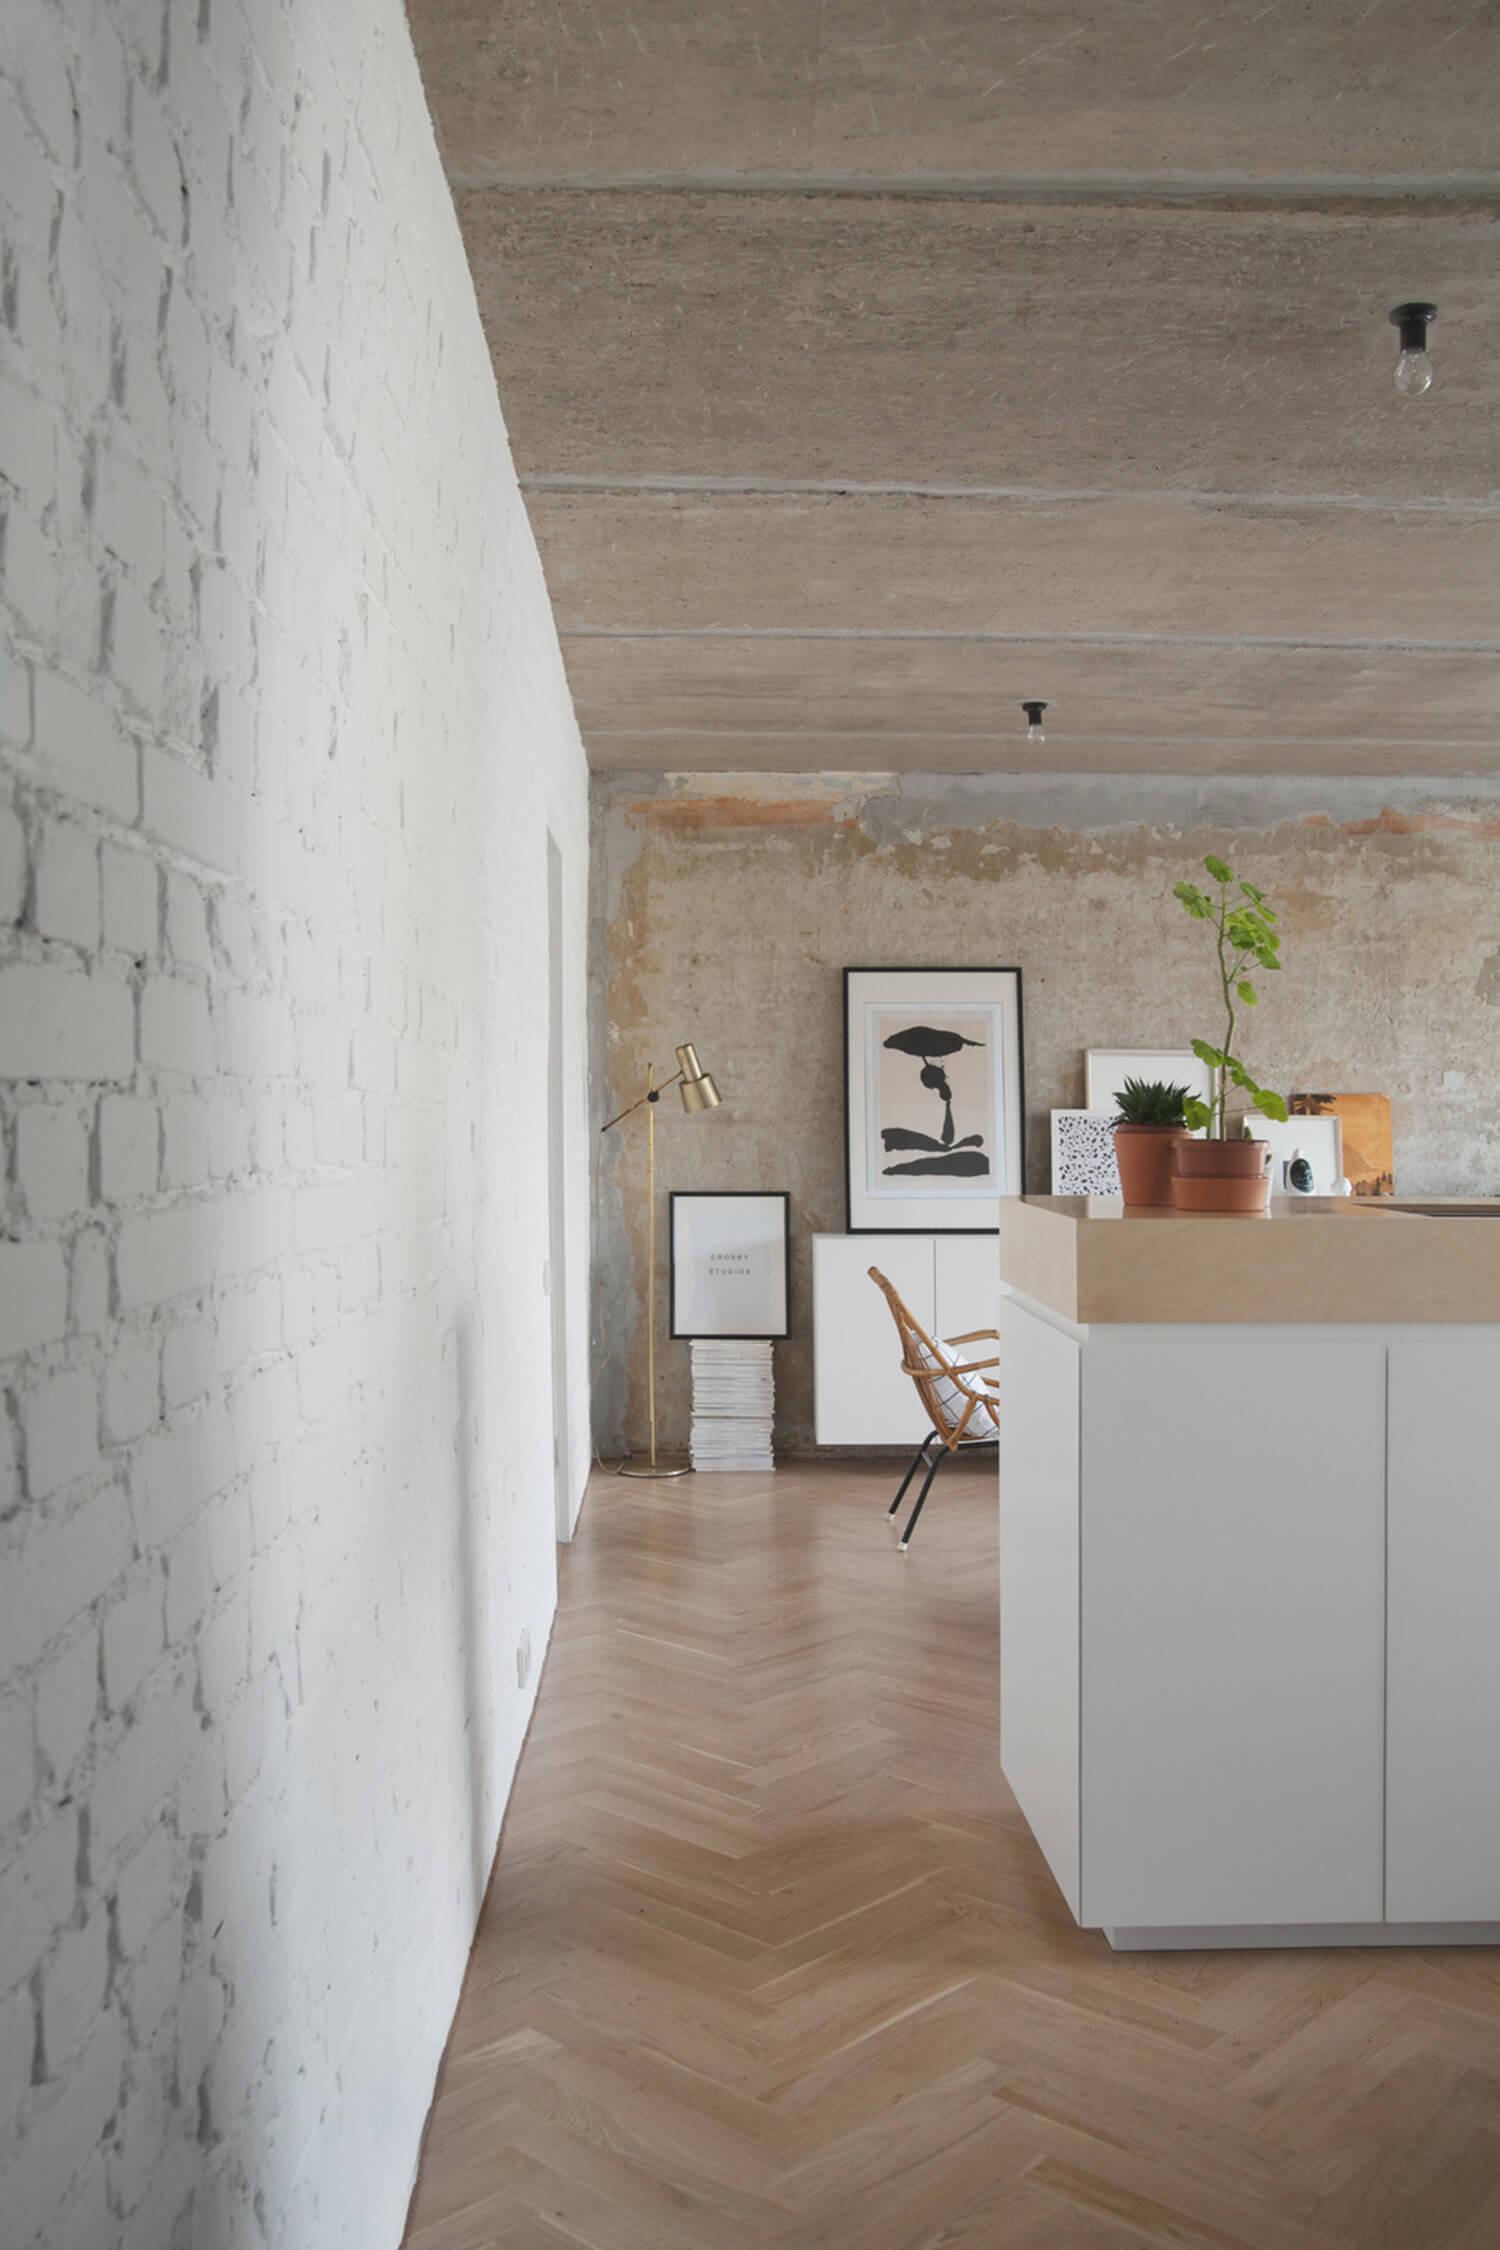 est living concrete ceiling apartment crosby studios.07